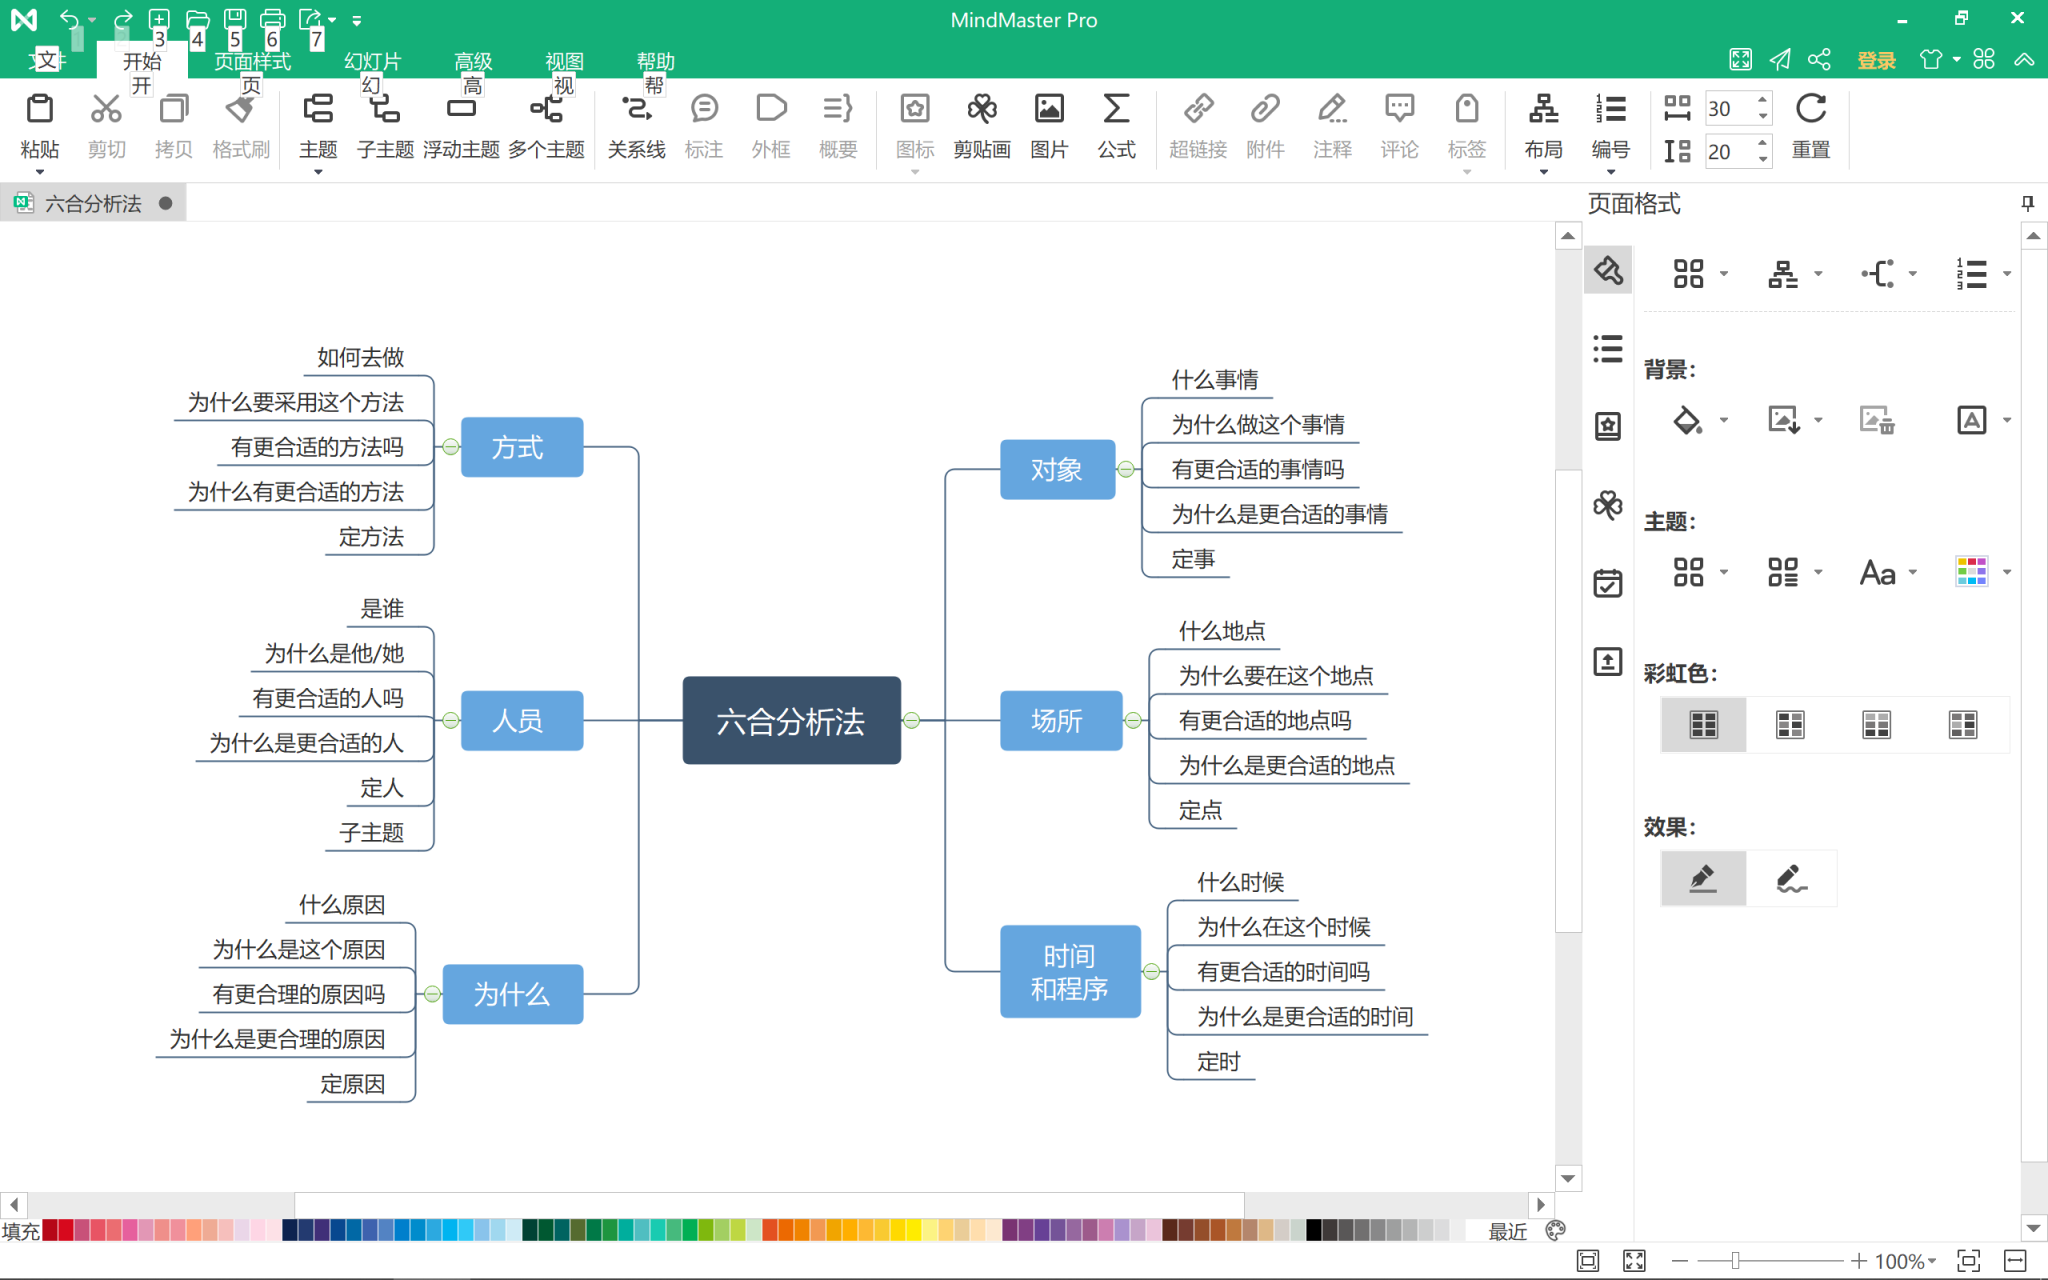 MindMaster专业版思维导图软件